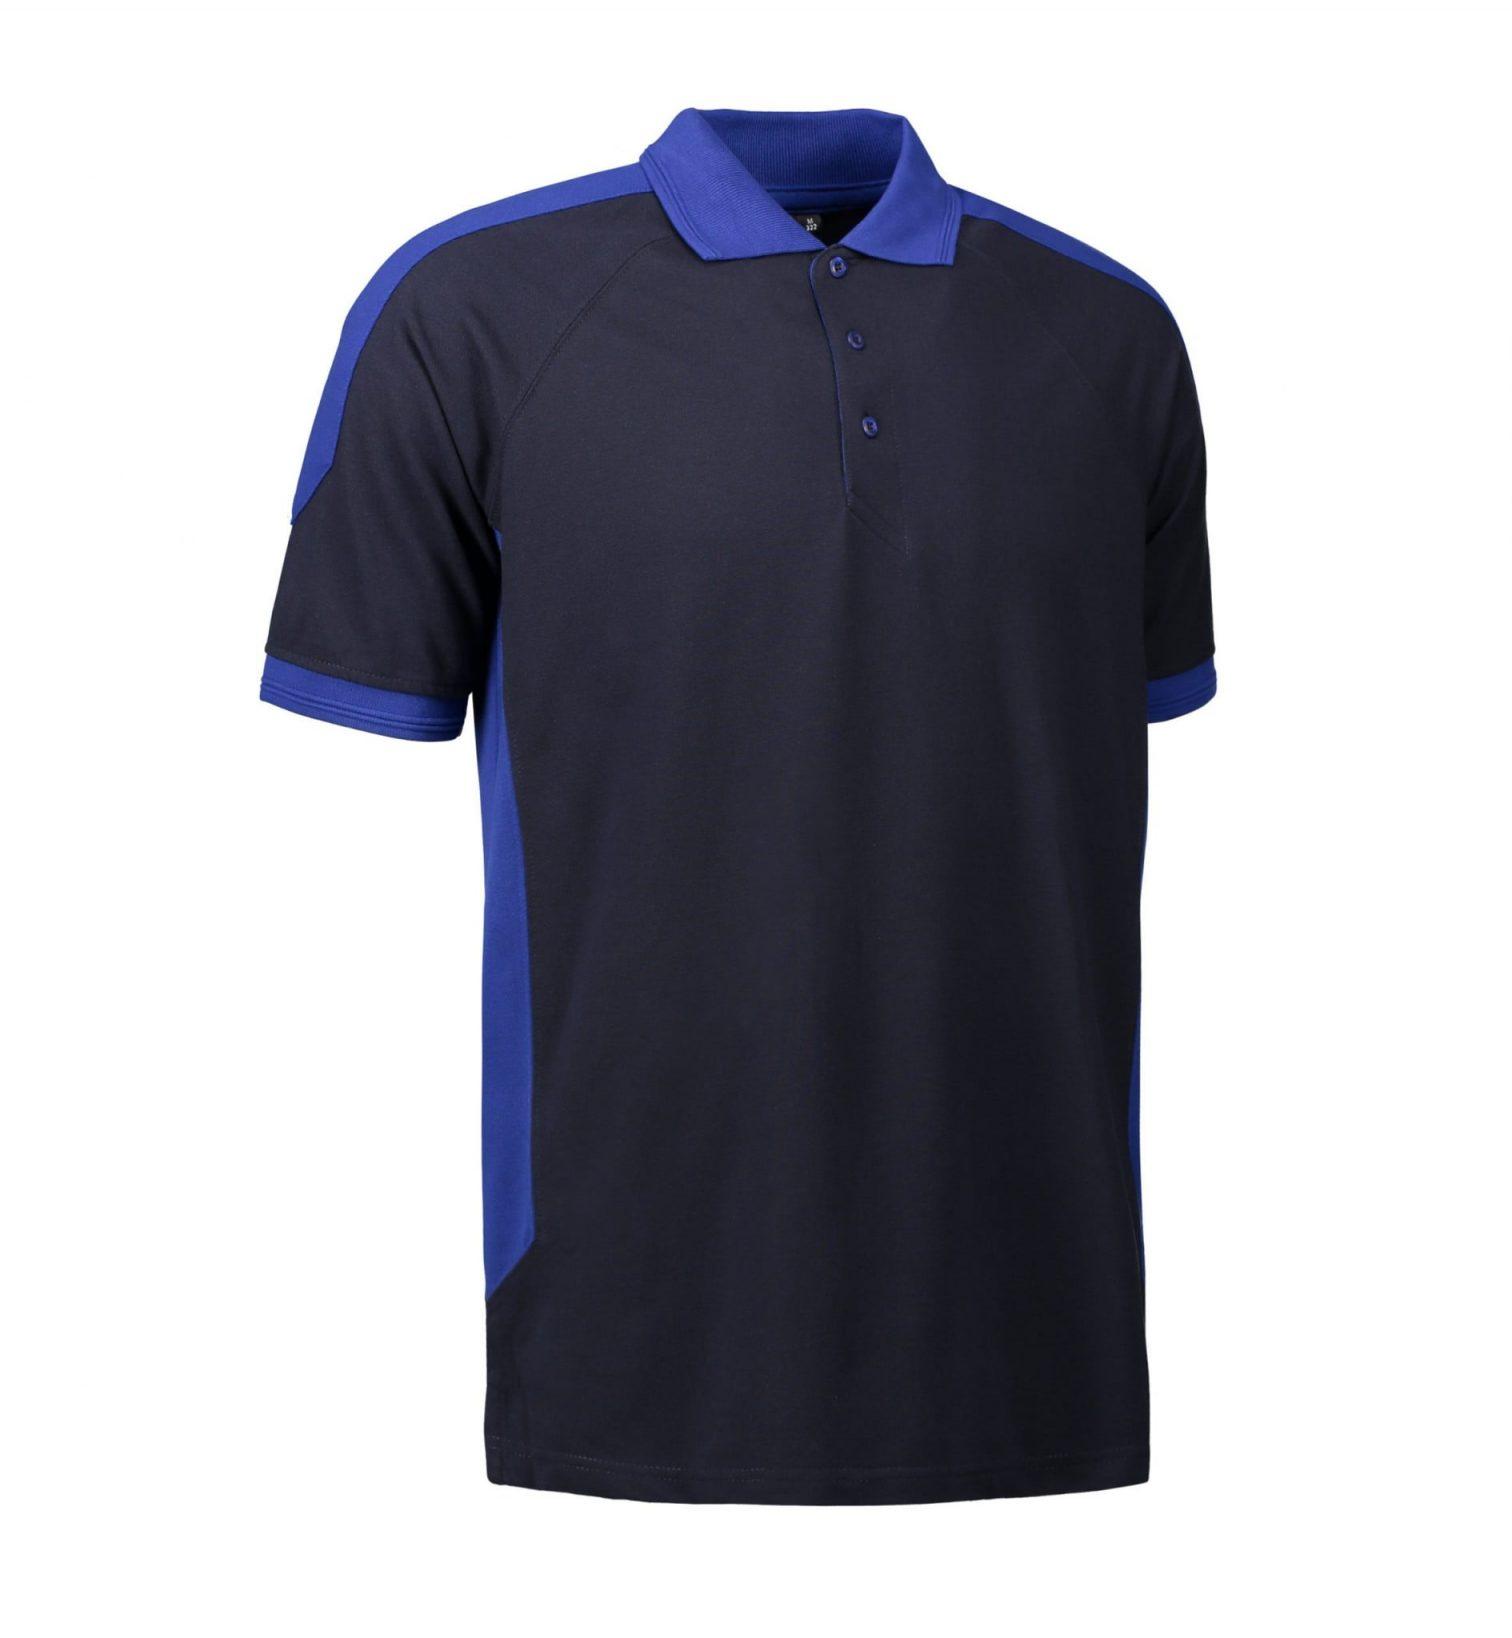 ID PRO Wear Slidstærk to-farvet poloshirt unisex navy